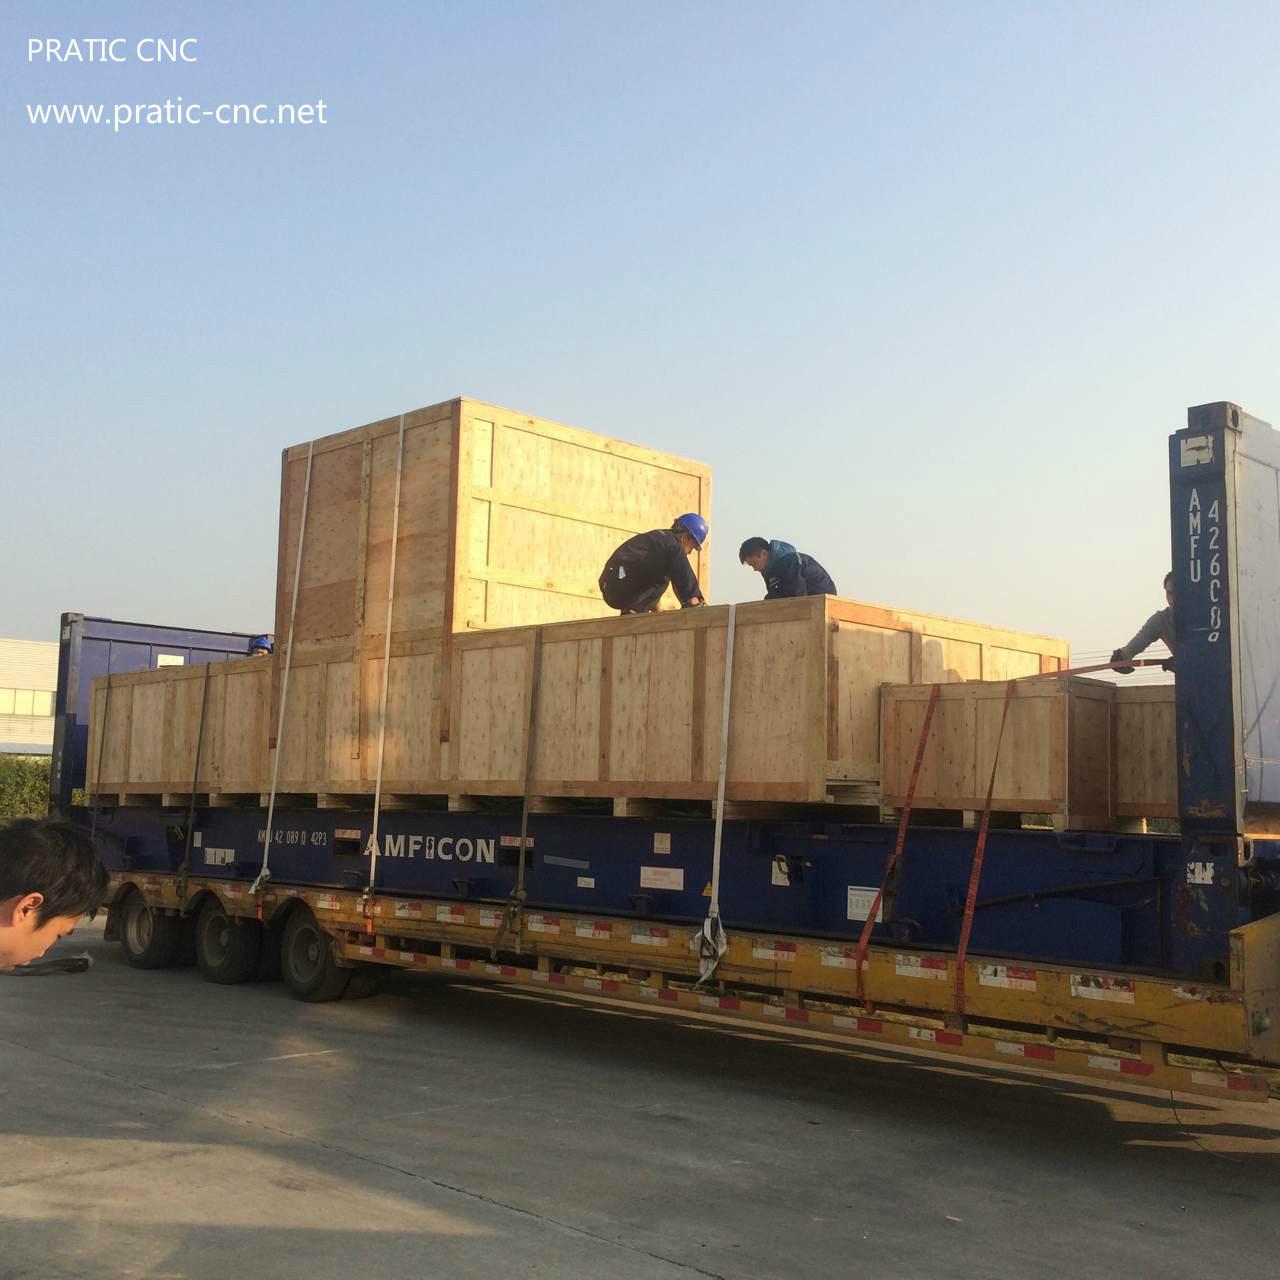 CNC 3 Axis Turret Tool Magazine Milling Machine -Pratic Pz Series